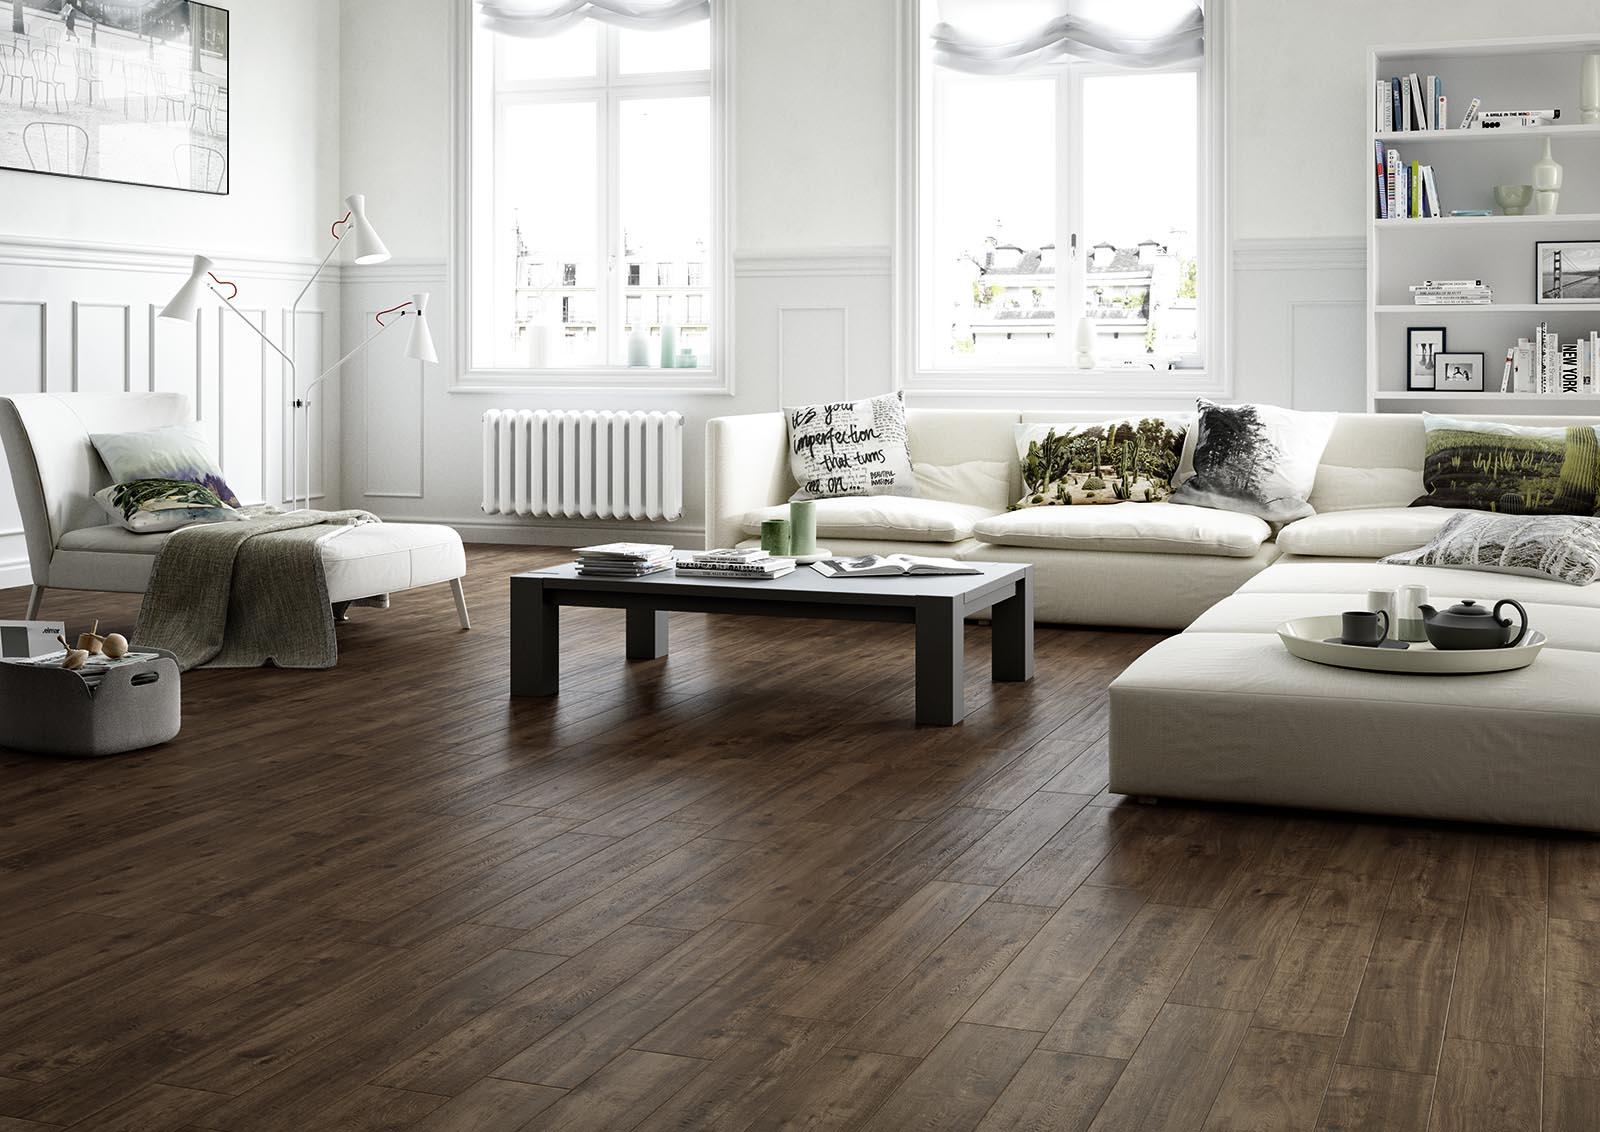 treverkway - pavimento in gres effetto legno | marazzi - Bagno Con Gres Effetto Legno